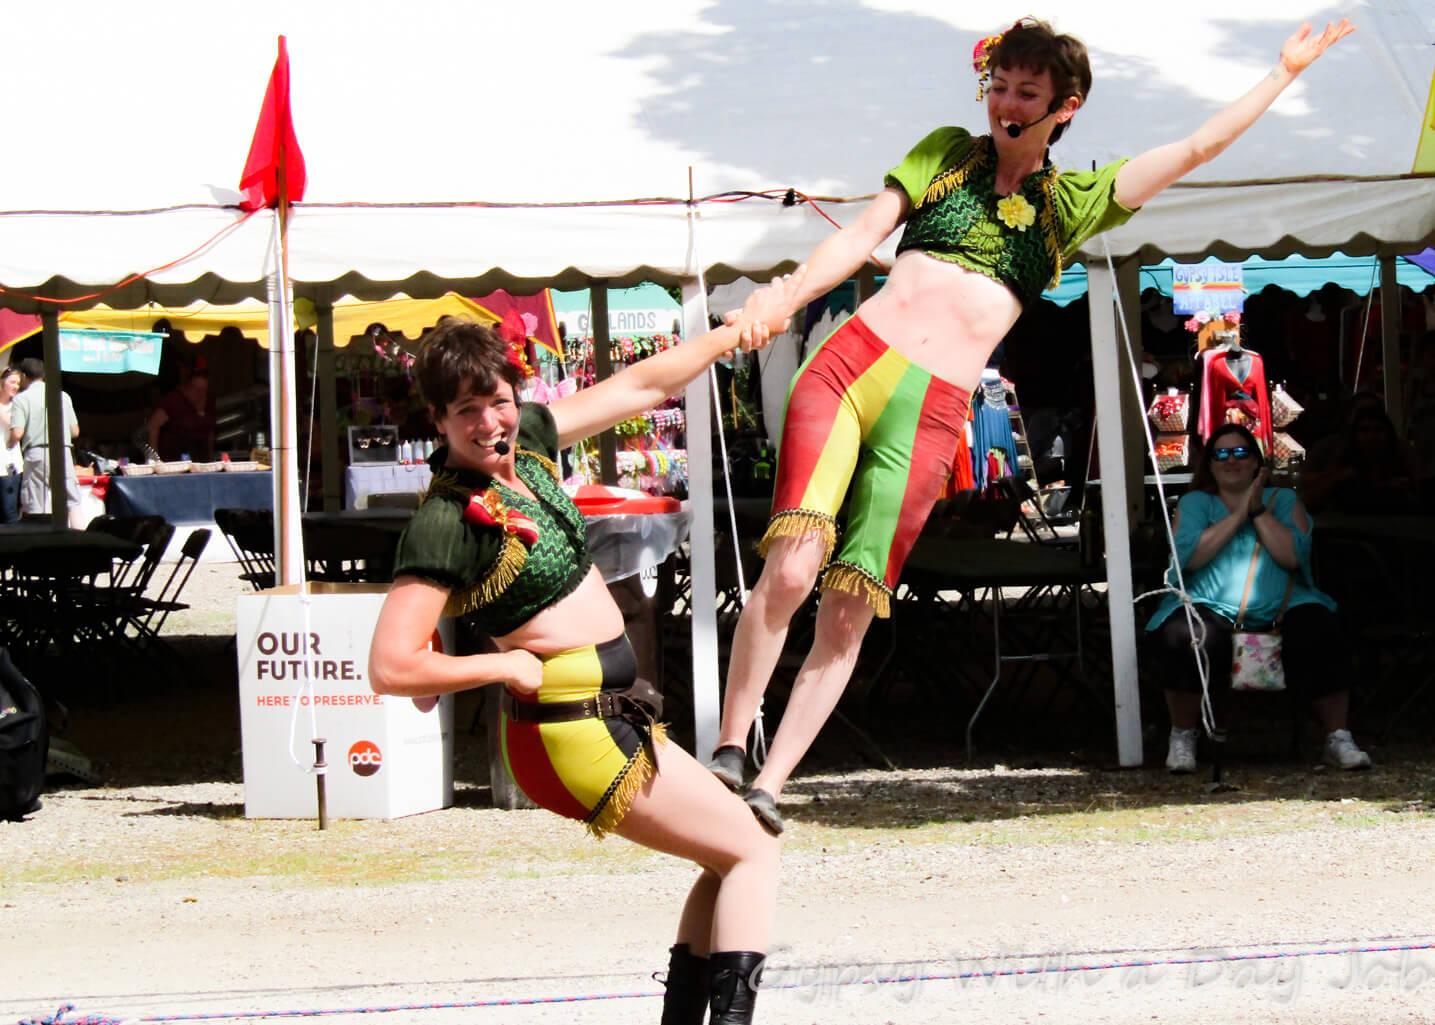 Acrobats Olde English Renaisance Wildlife Priaire